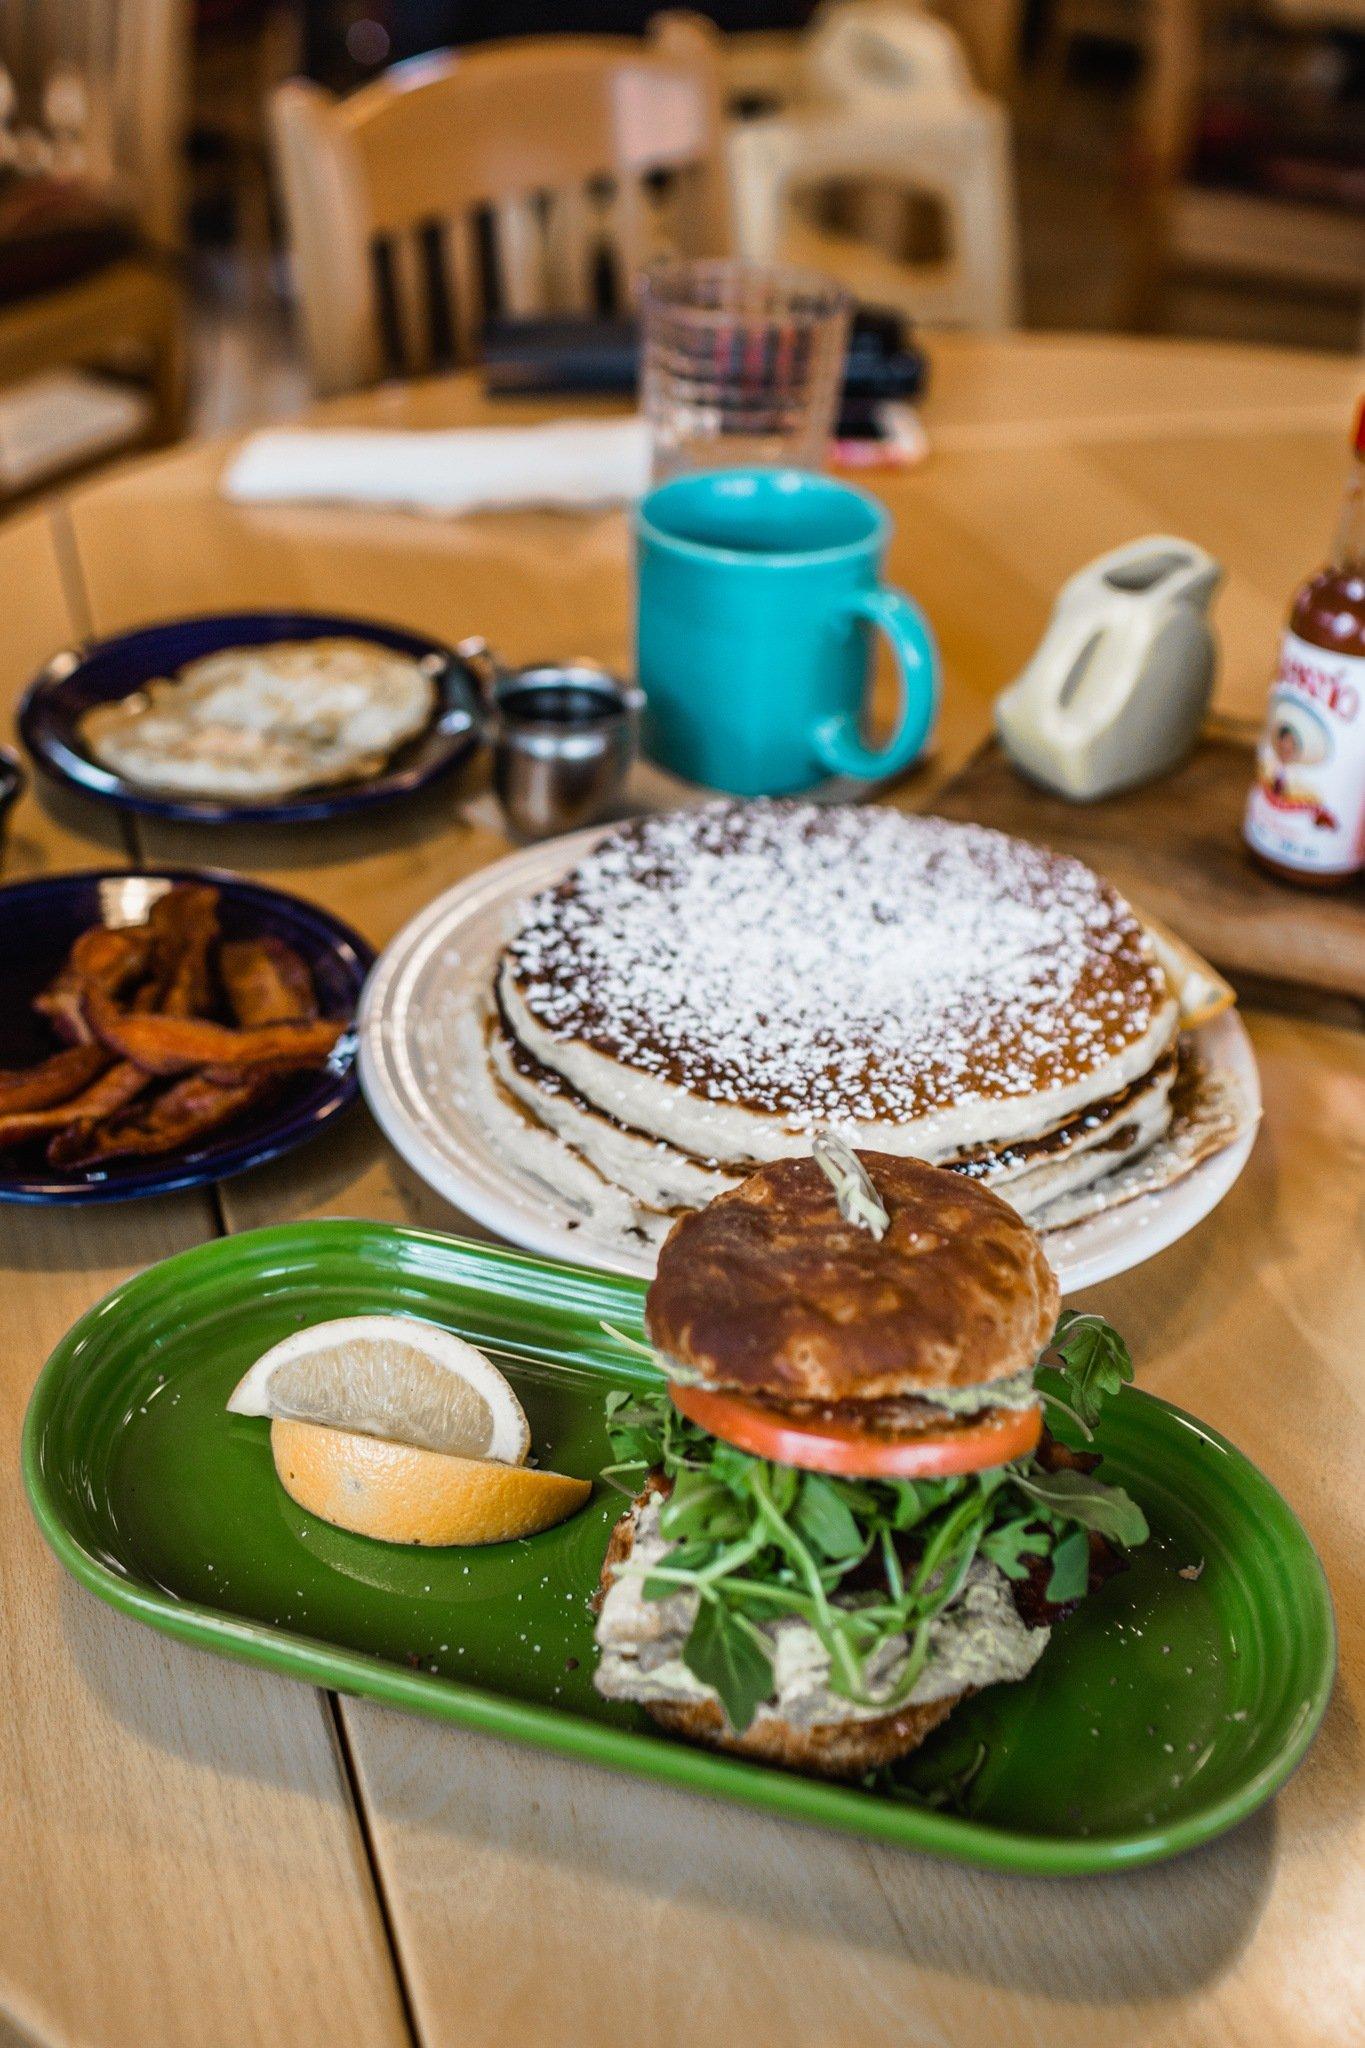 Breakfast at O'Grady's